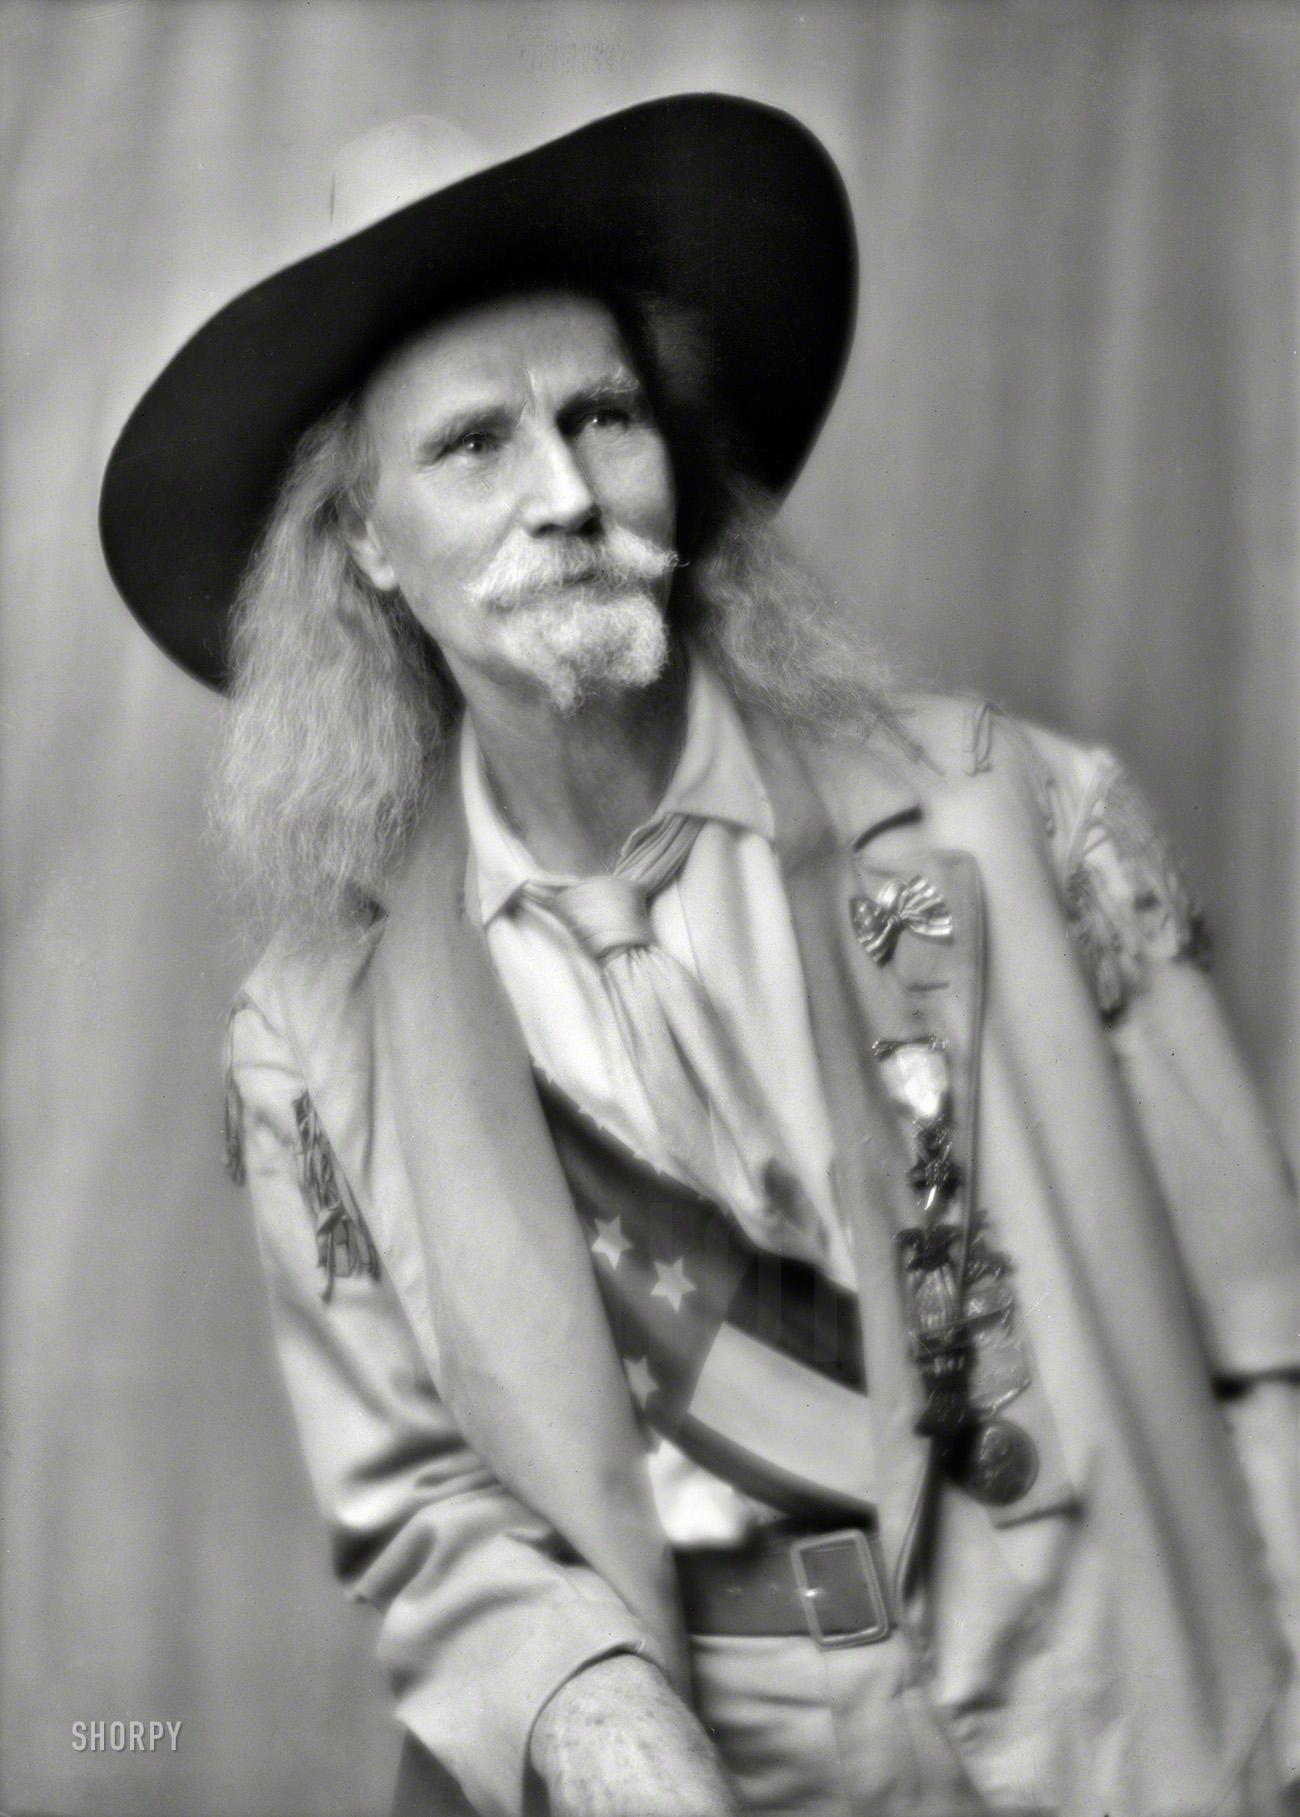 Shorpy Historic Picture Archive Captain Jack 1915 high